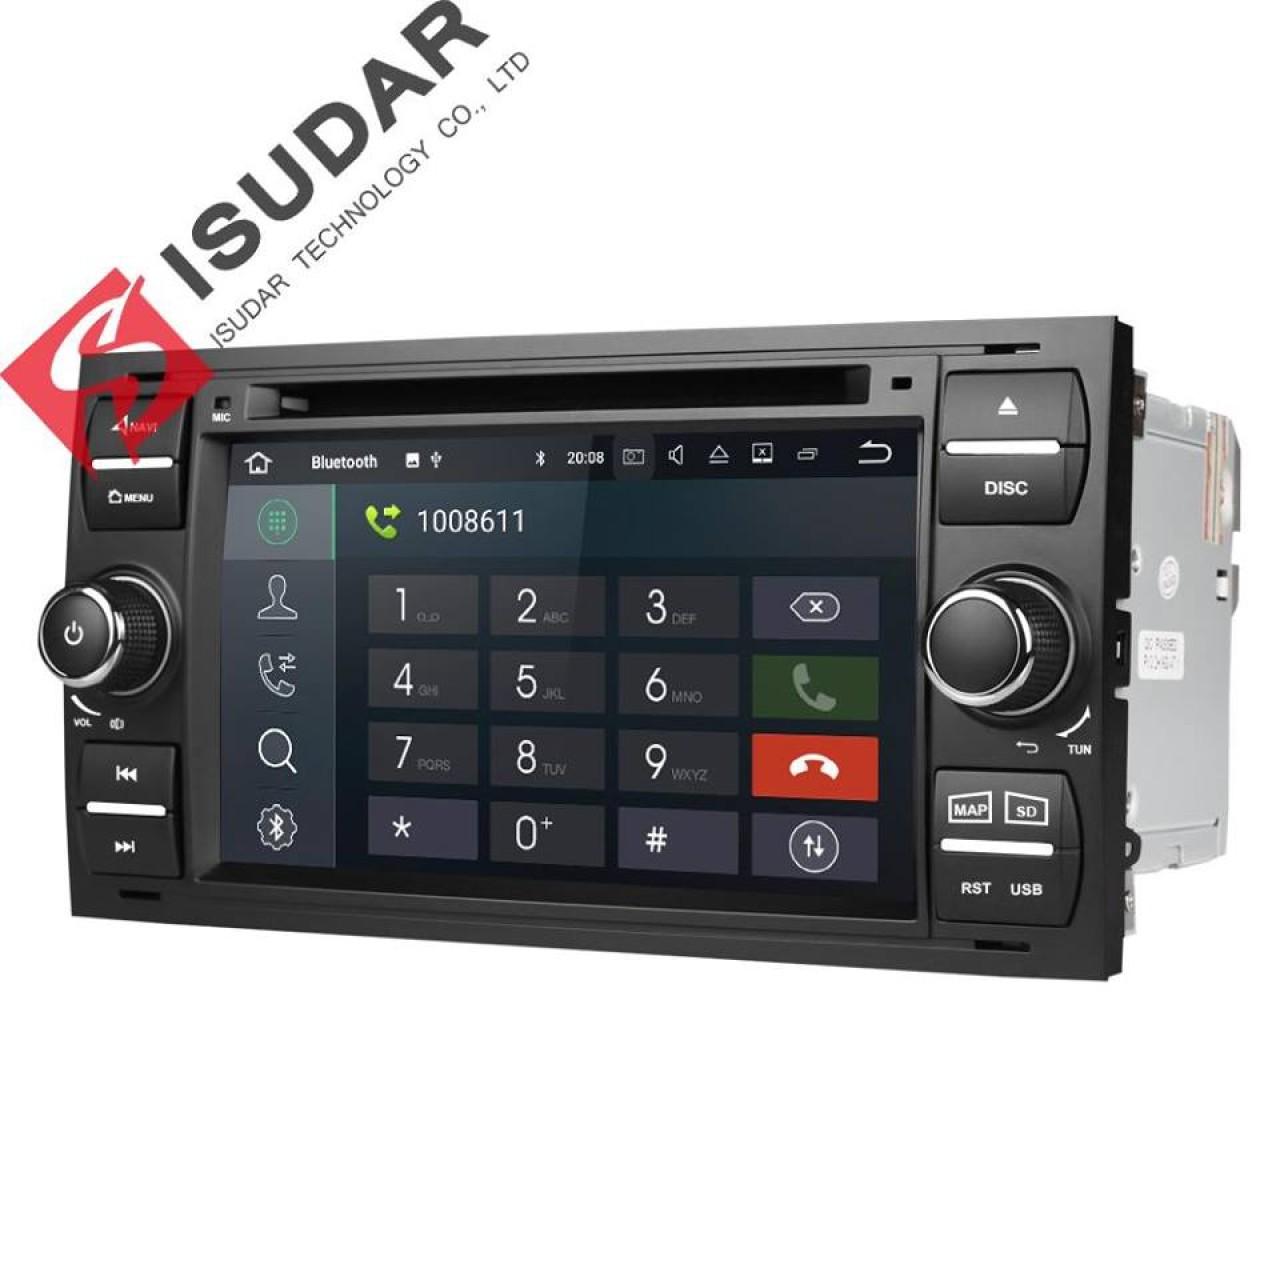 NAVIGATIE ANDROID 8.1 DEDICATA FORD FUSION ECRAN IPS 16GB DVD CARKIT USB SD GPS WAZE NAV-D9488B